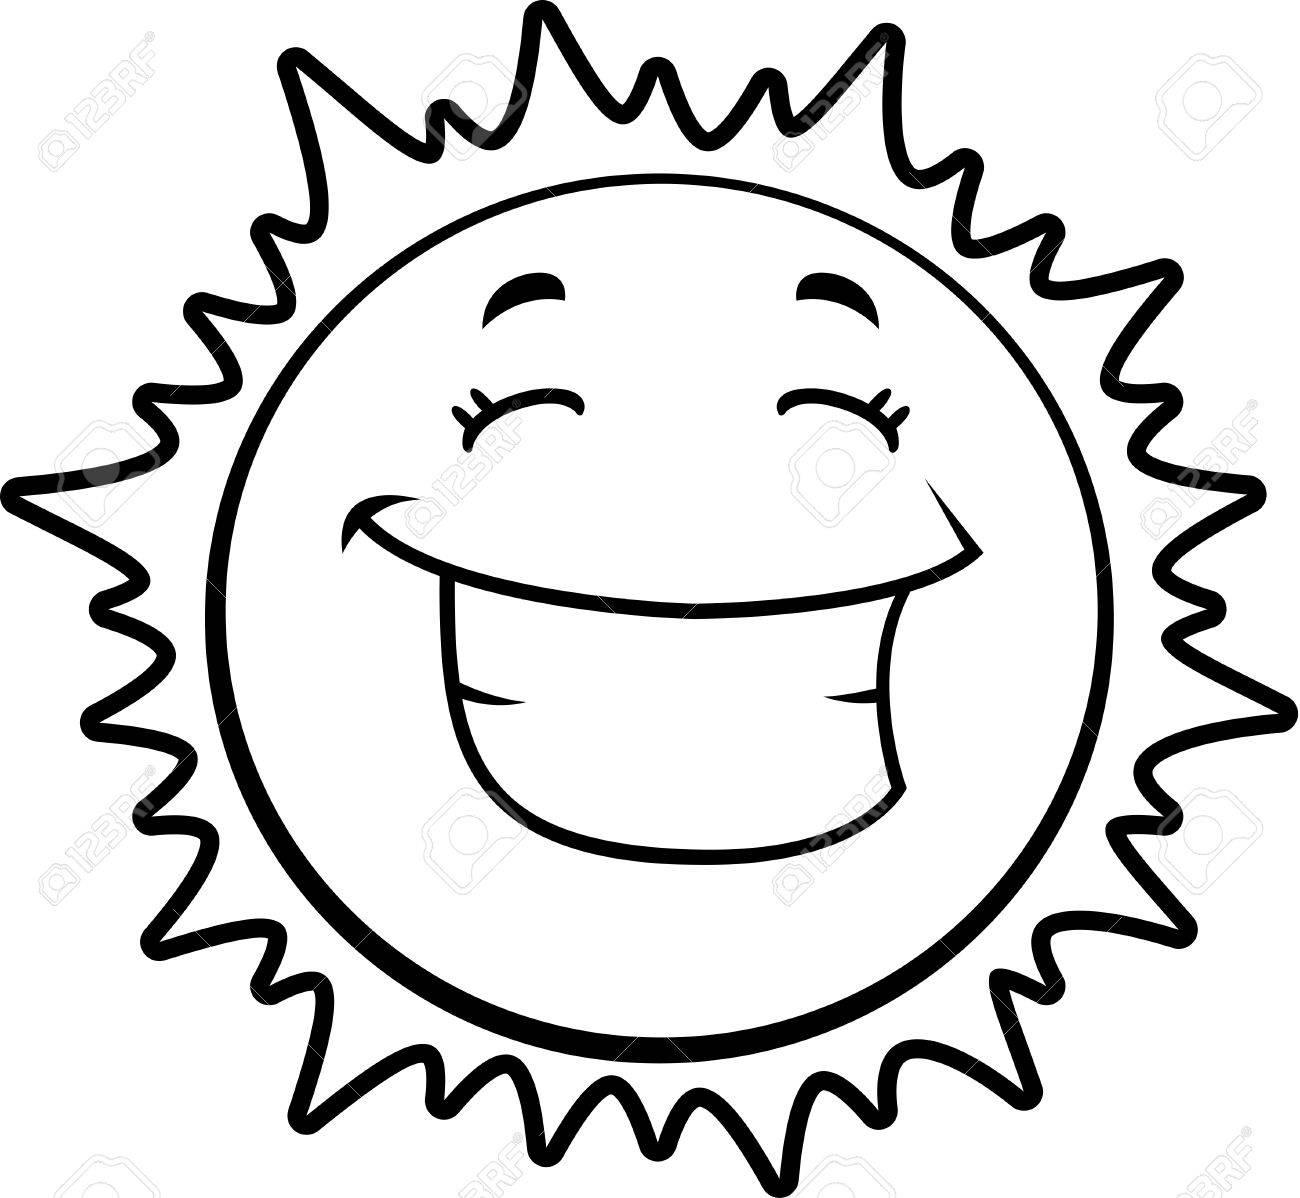 Sun clip art cartoon Royalty Free Vector Image